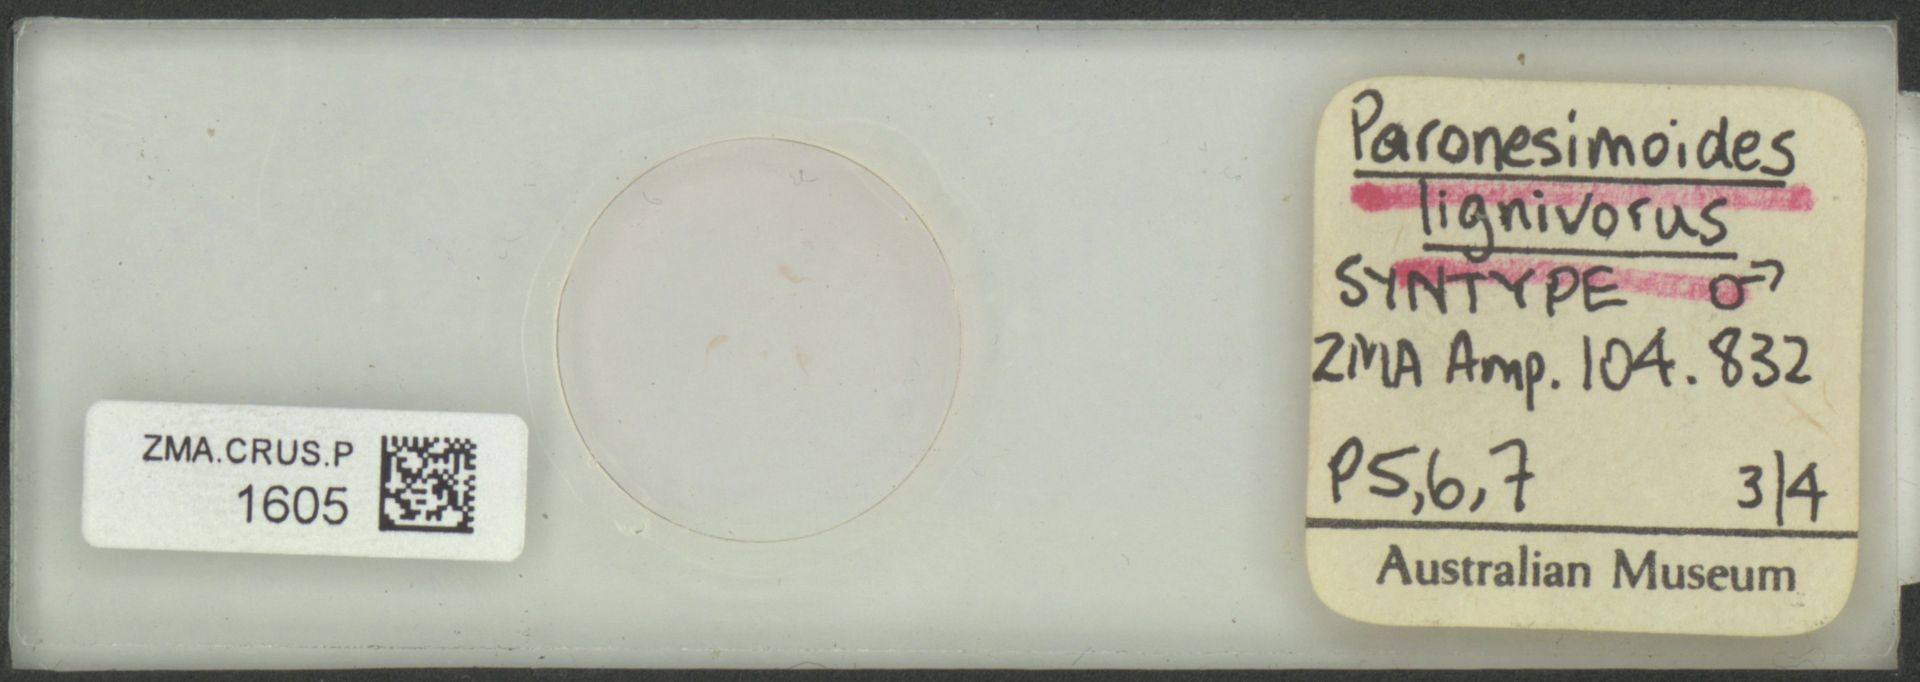 ZMA.CRUS.P.1605 | Paronesimoides lignivorus